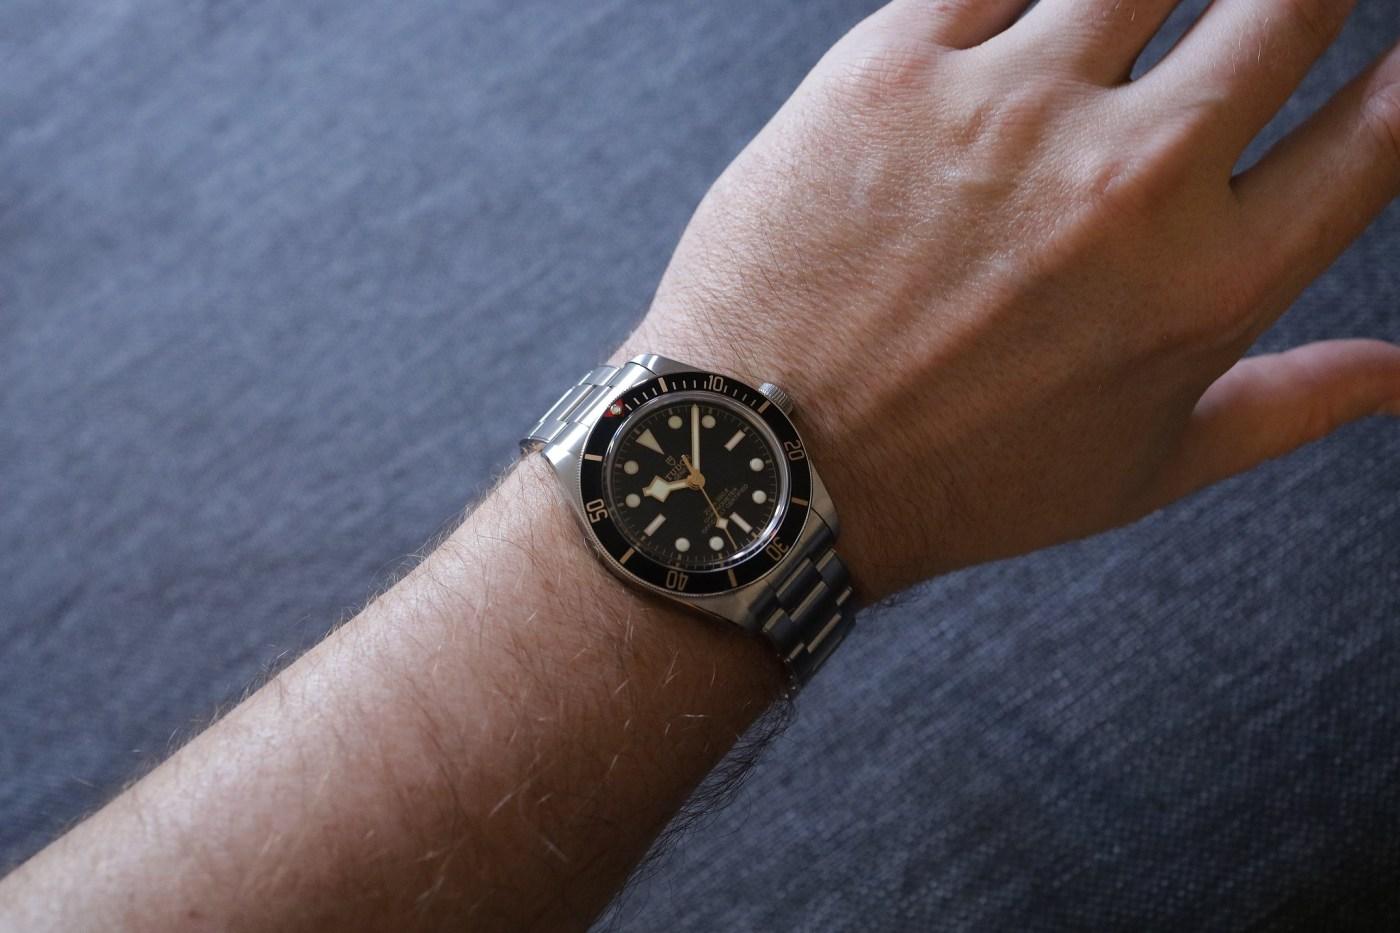 Black Bay 59 wristshot with t-shirt